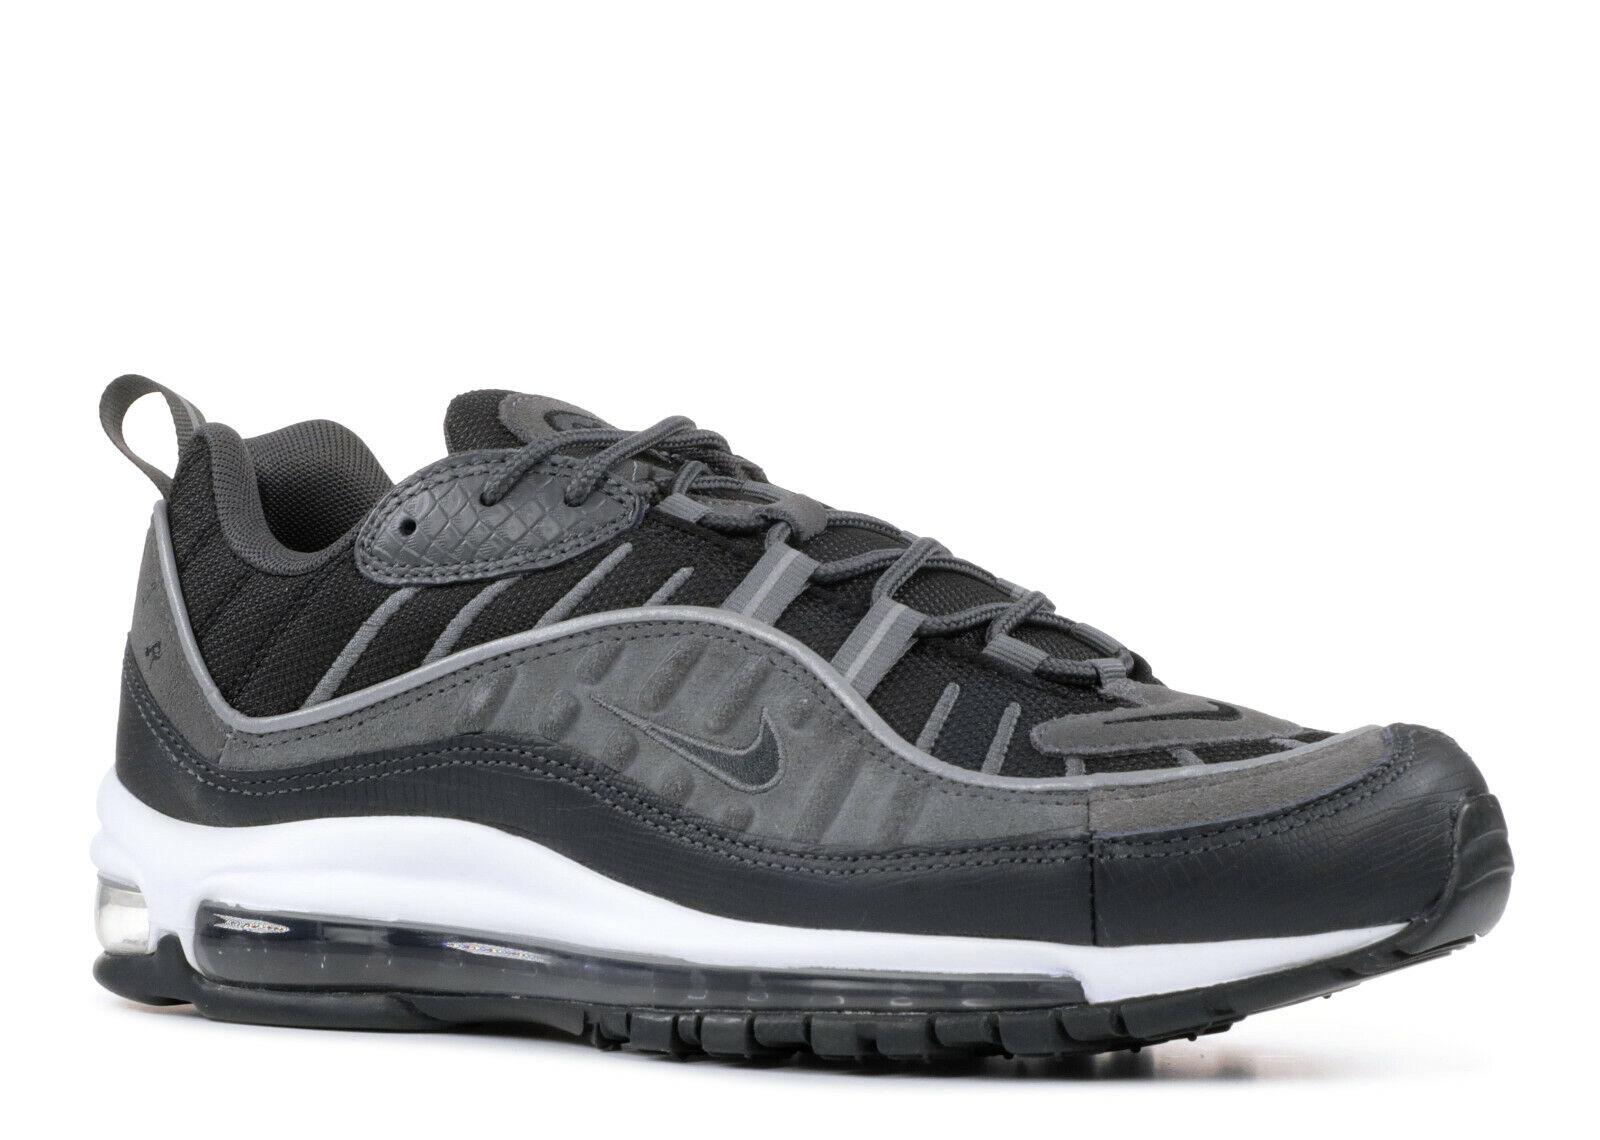 New Men's Air Max 98 SE Black Anthracite Dark Grey size 9 AO9380 001